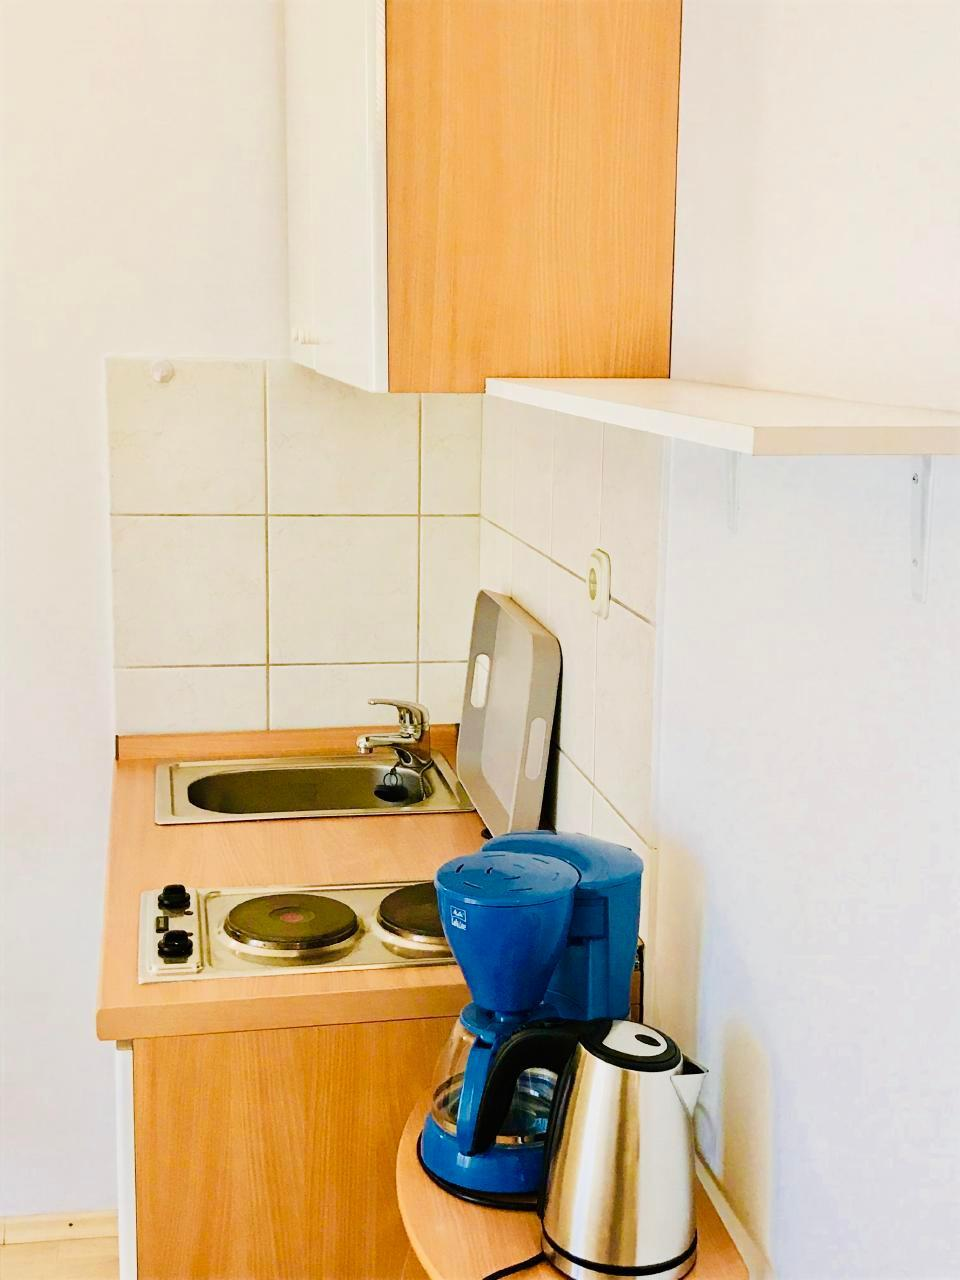 Ferienwohnung Apartmenthaus Ruza 3 - Studio (98391), Kaštel Štafilić, , Dalmatien, Kroatien, Bild 6